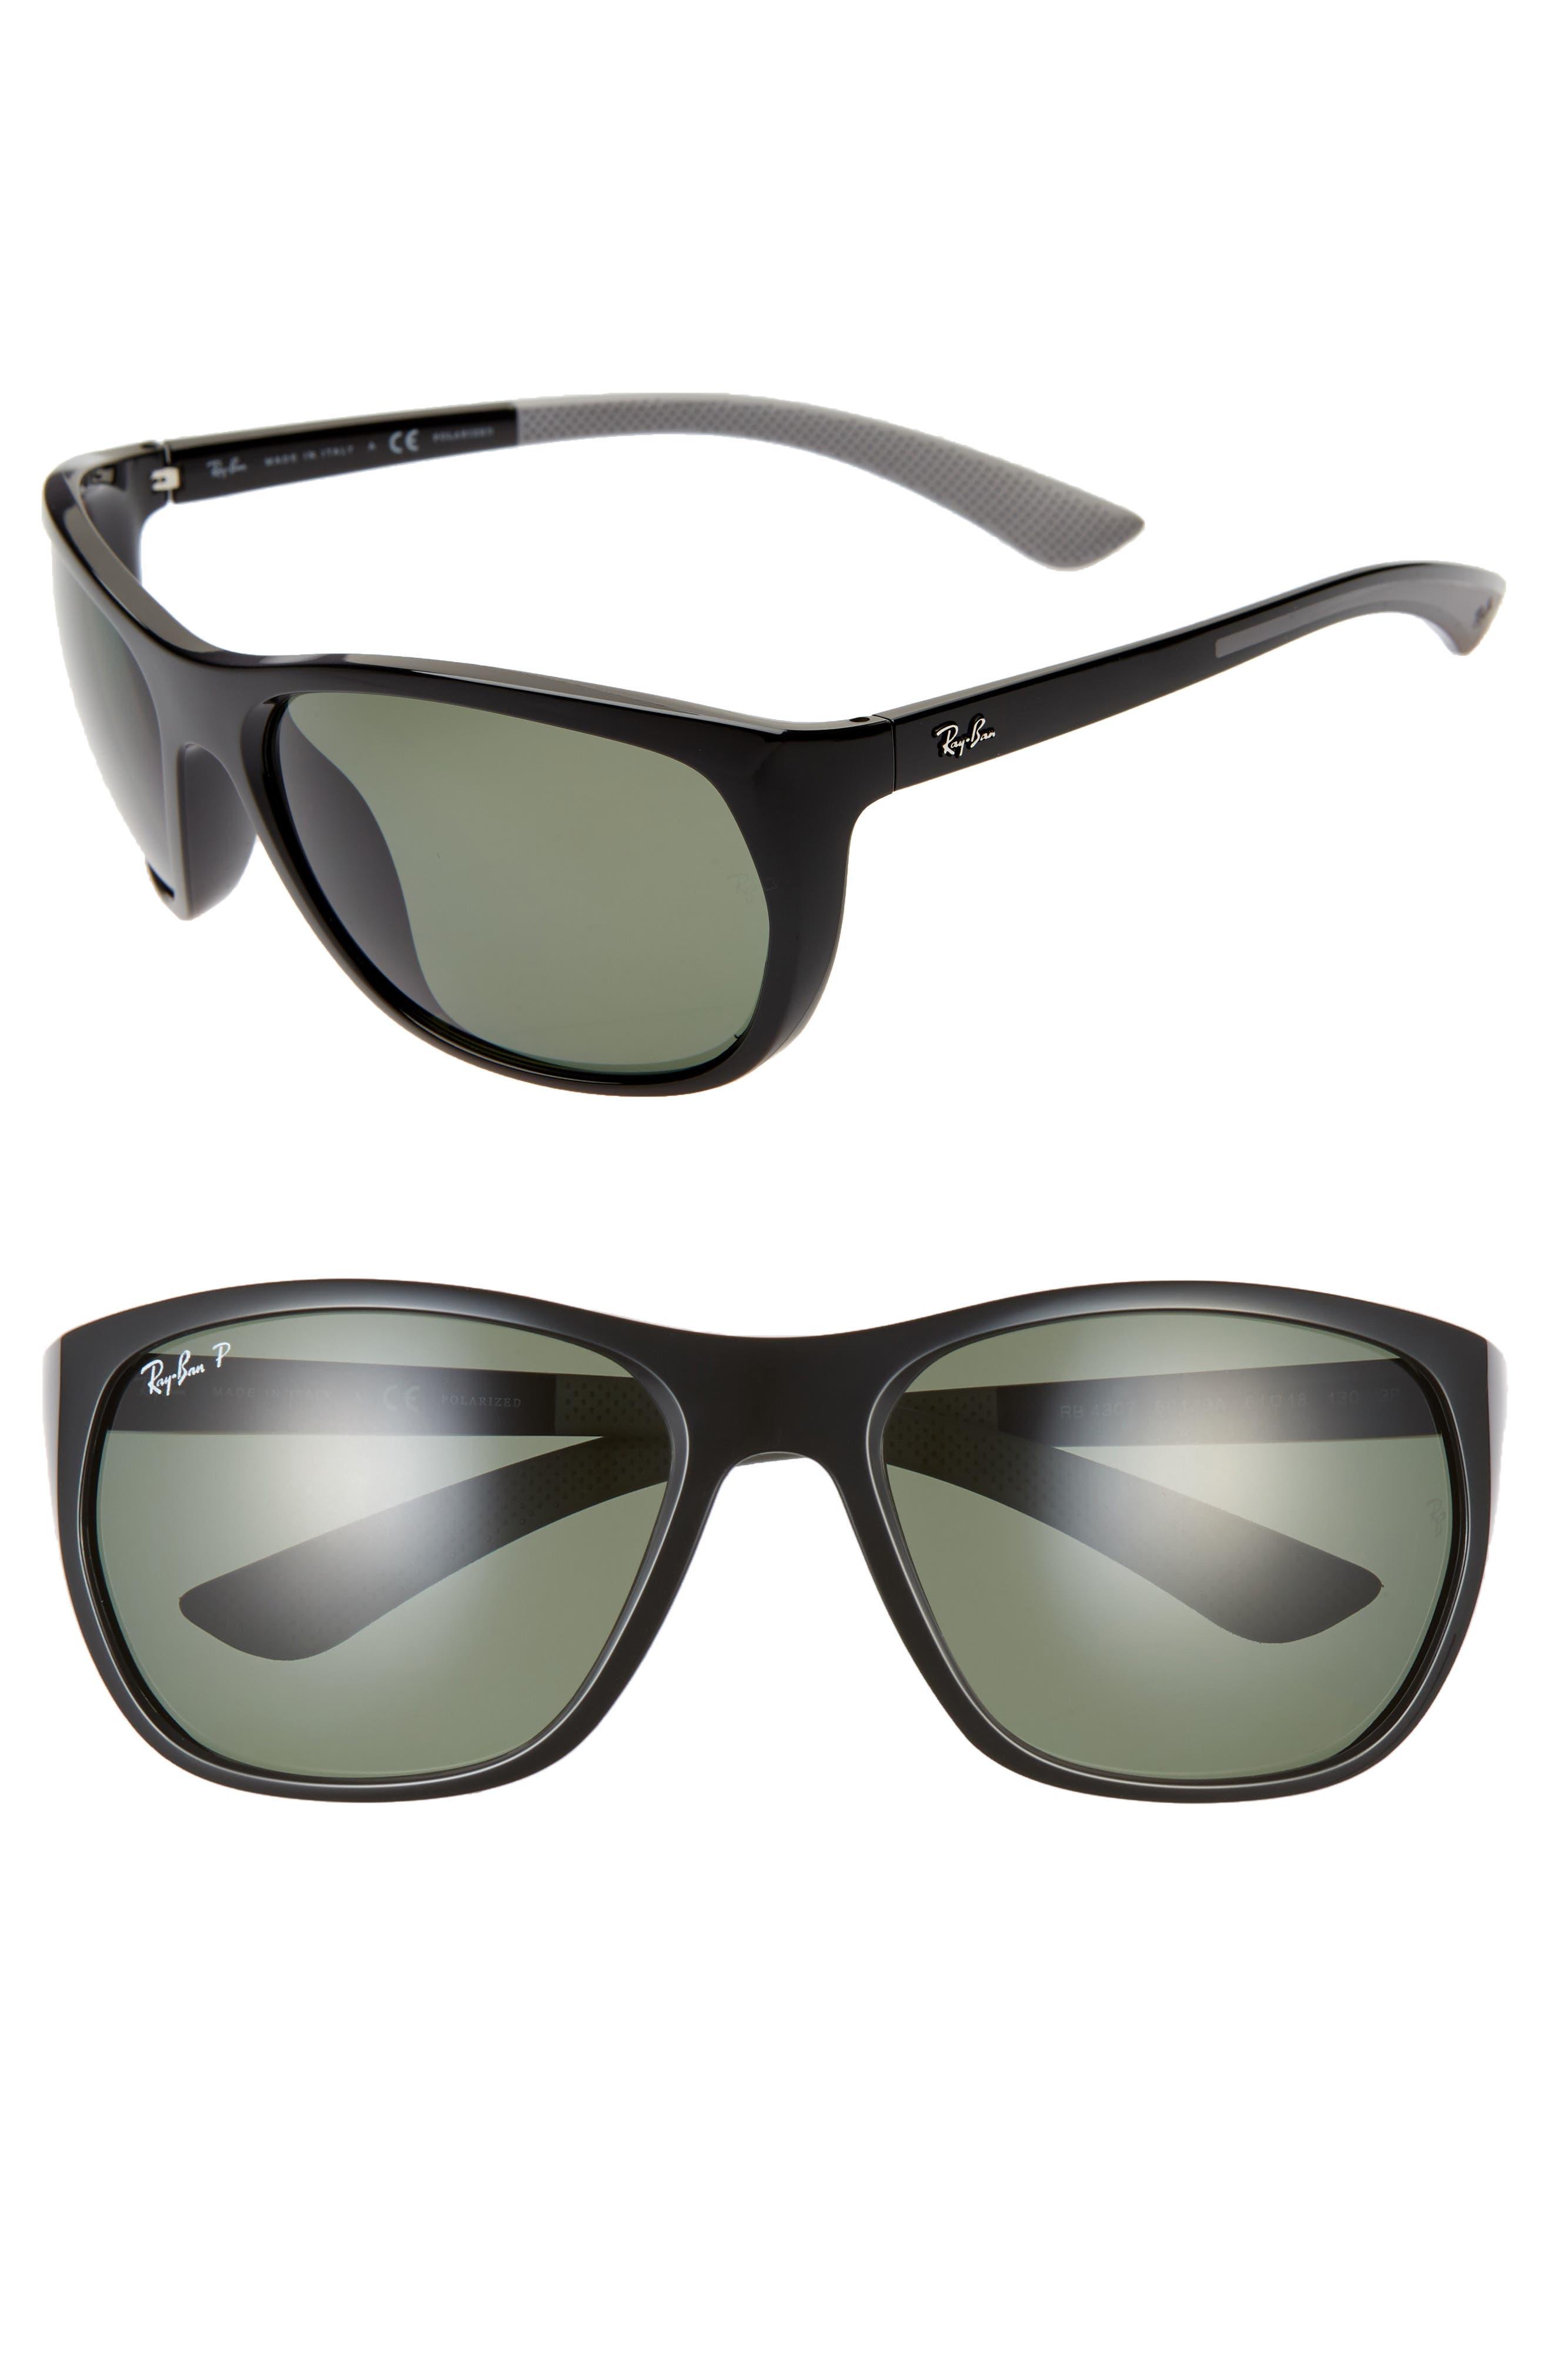 Ray-Ban 61Mm Wrap Sunglasses - Black